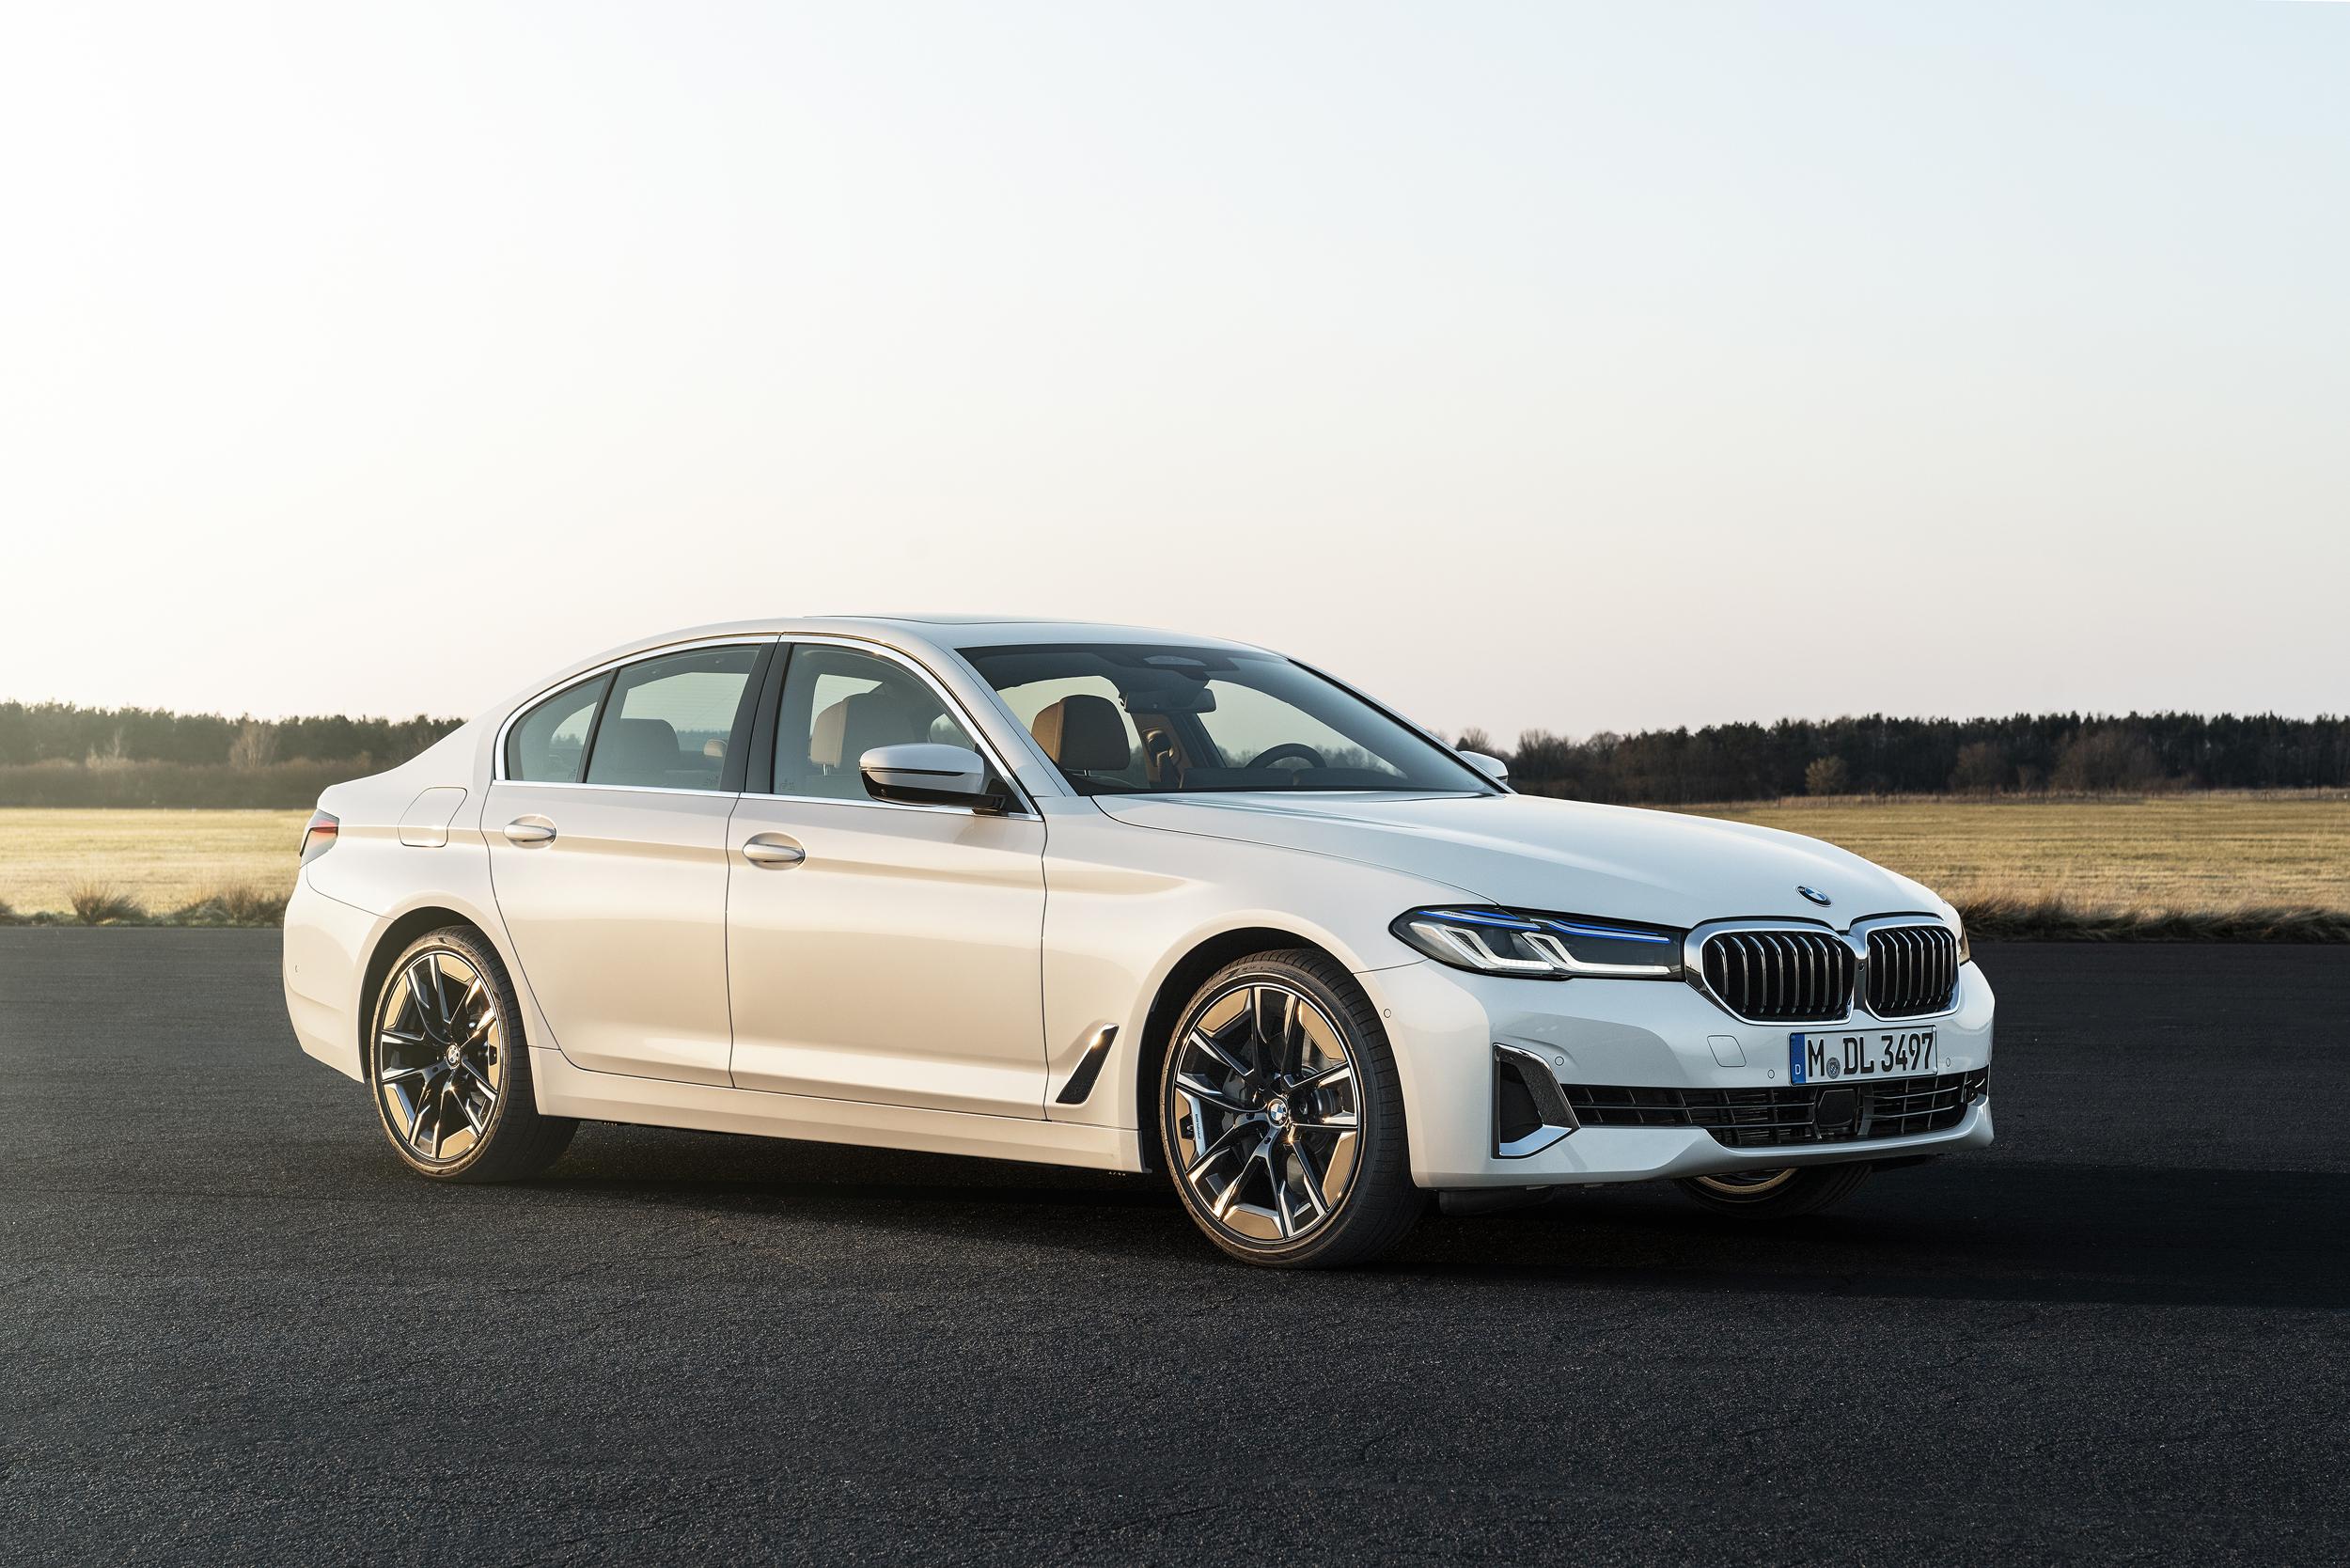 The new BMW 540i Sedan